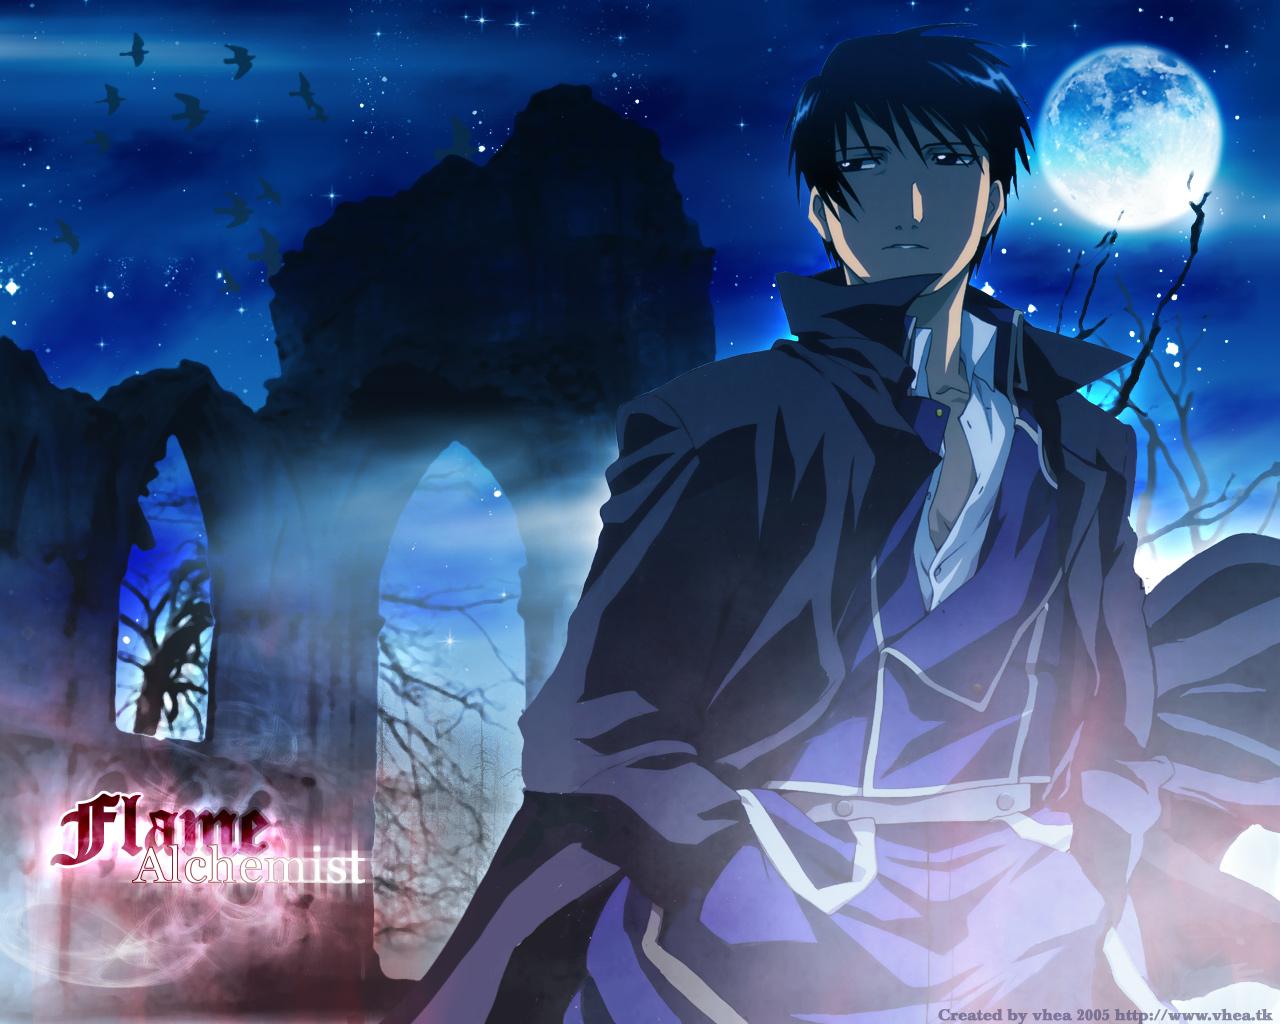 Fullmetal Alchemist Roy Mustang 1280x1024 Wallpaper Wallpaper 54 1280x1024